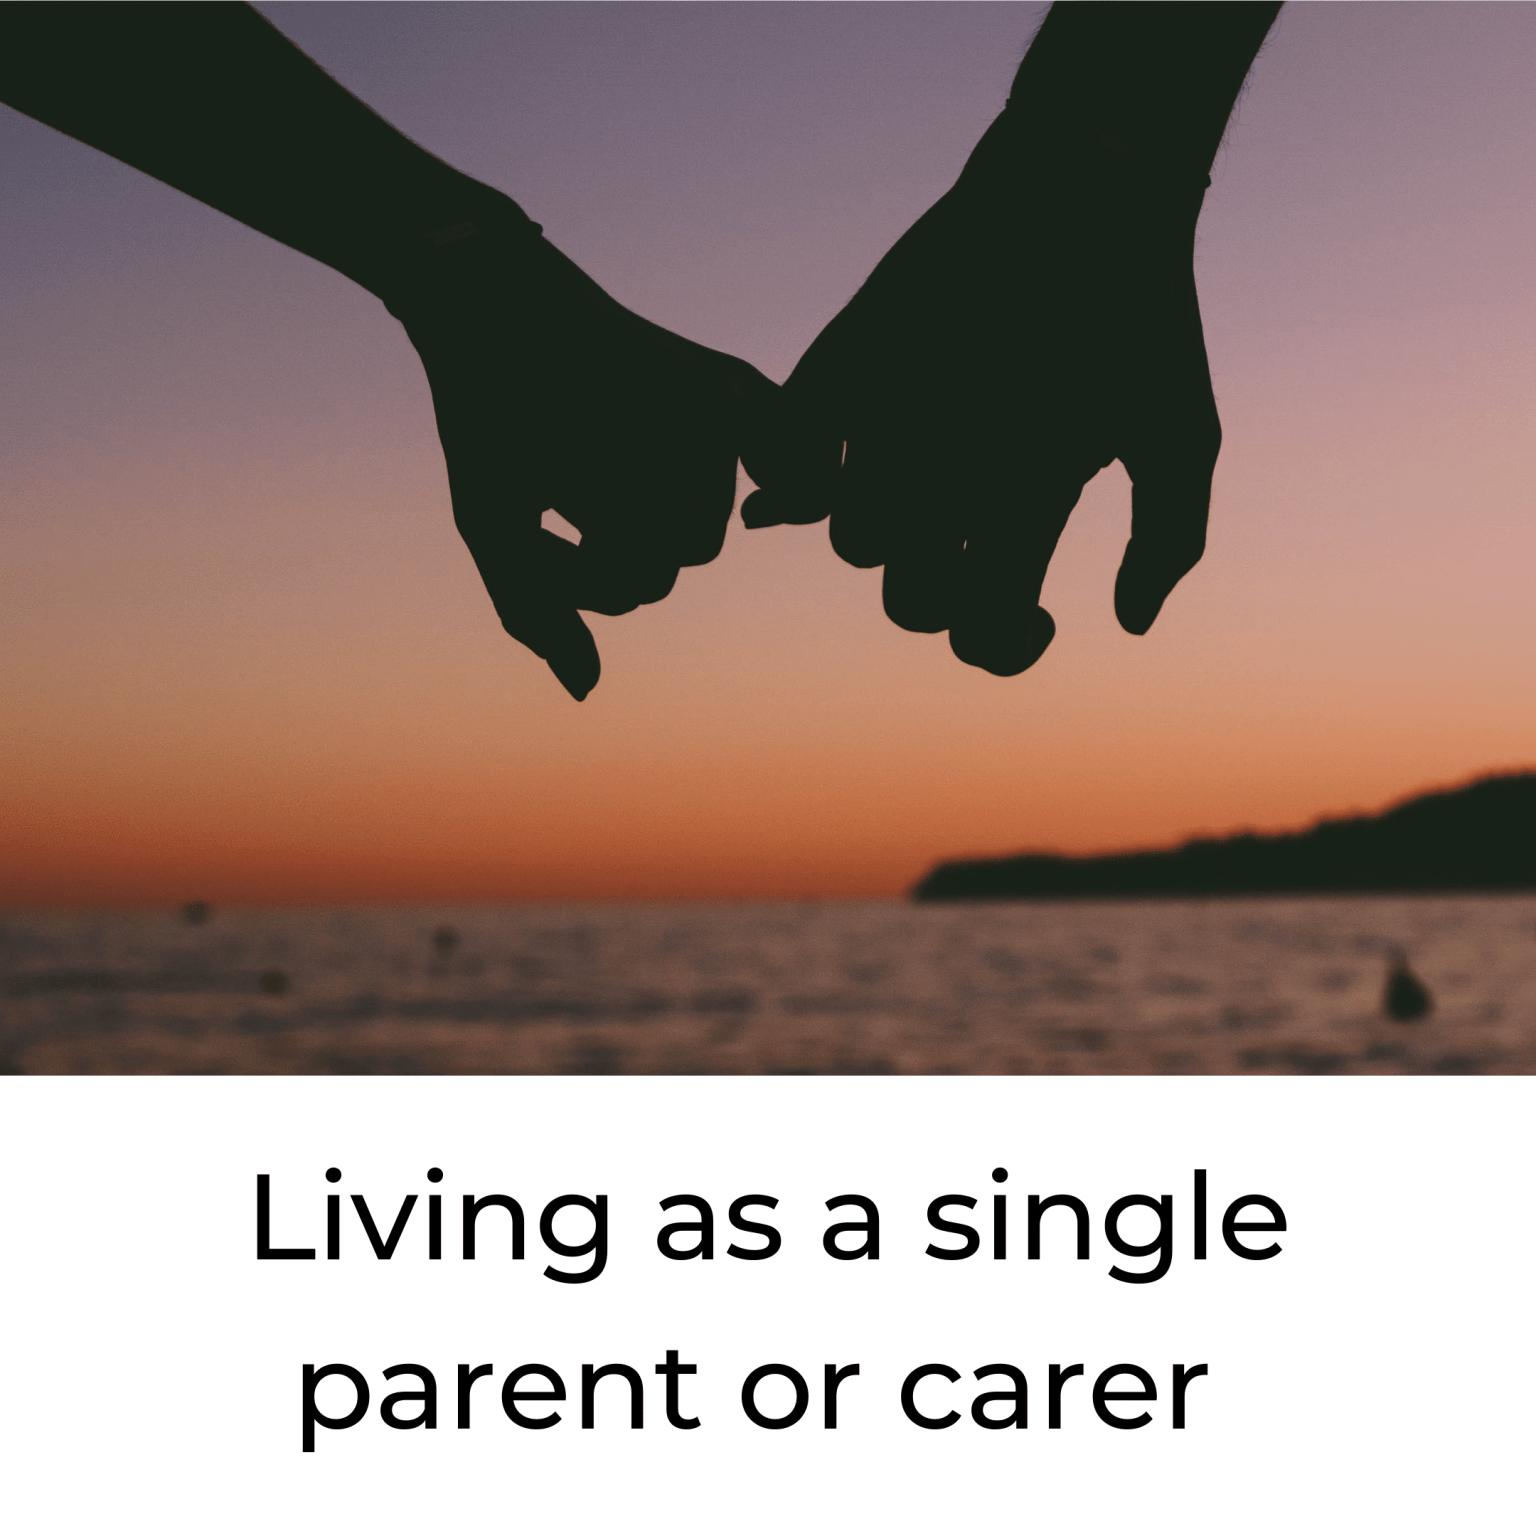 living alone as a single parent